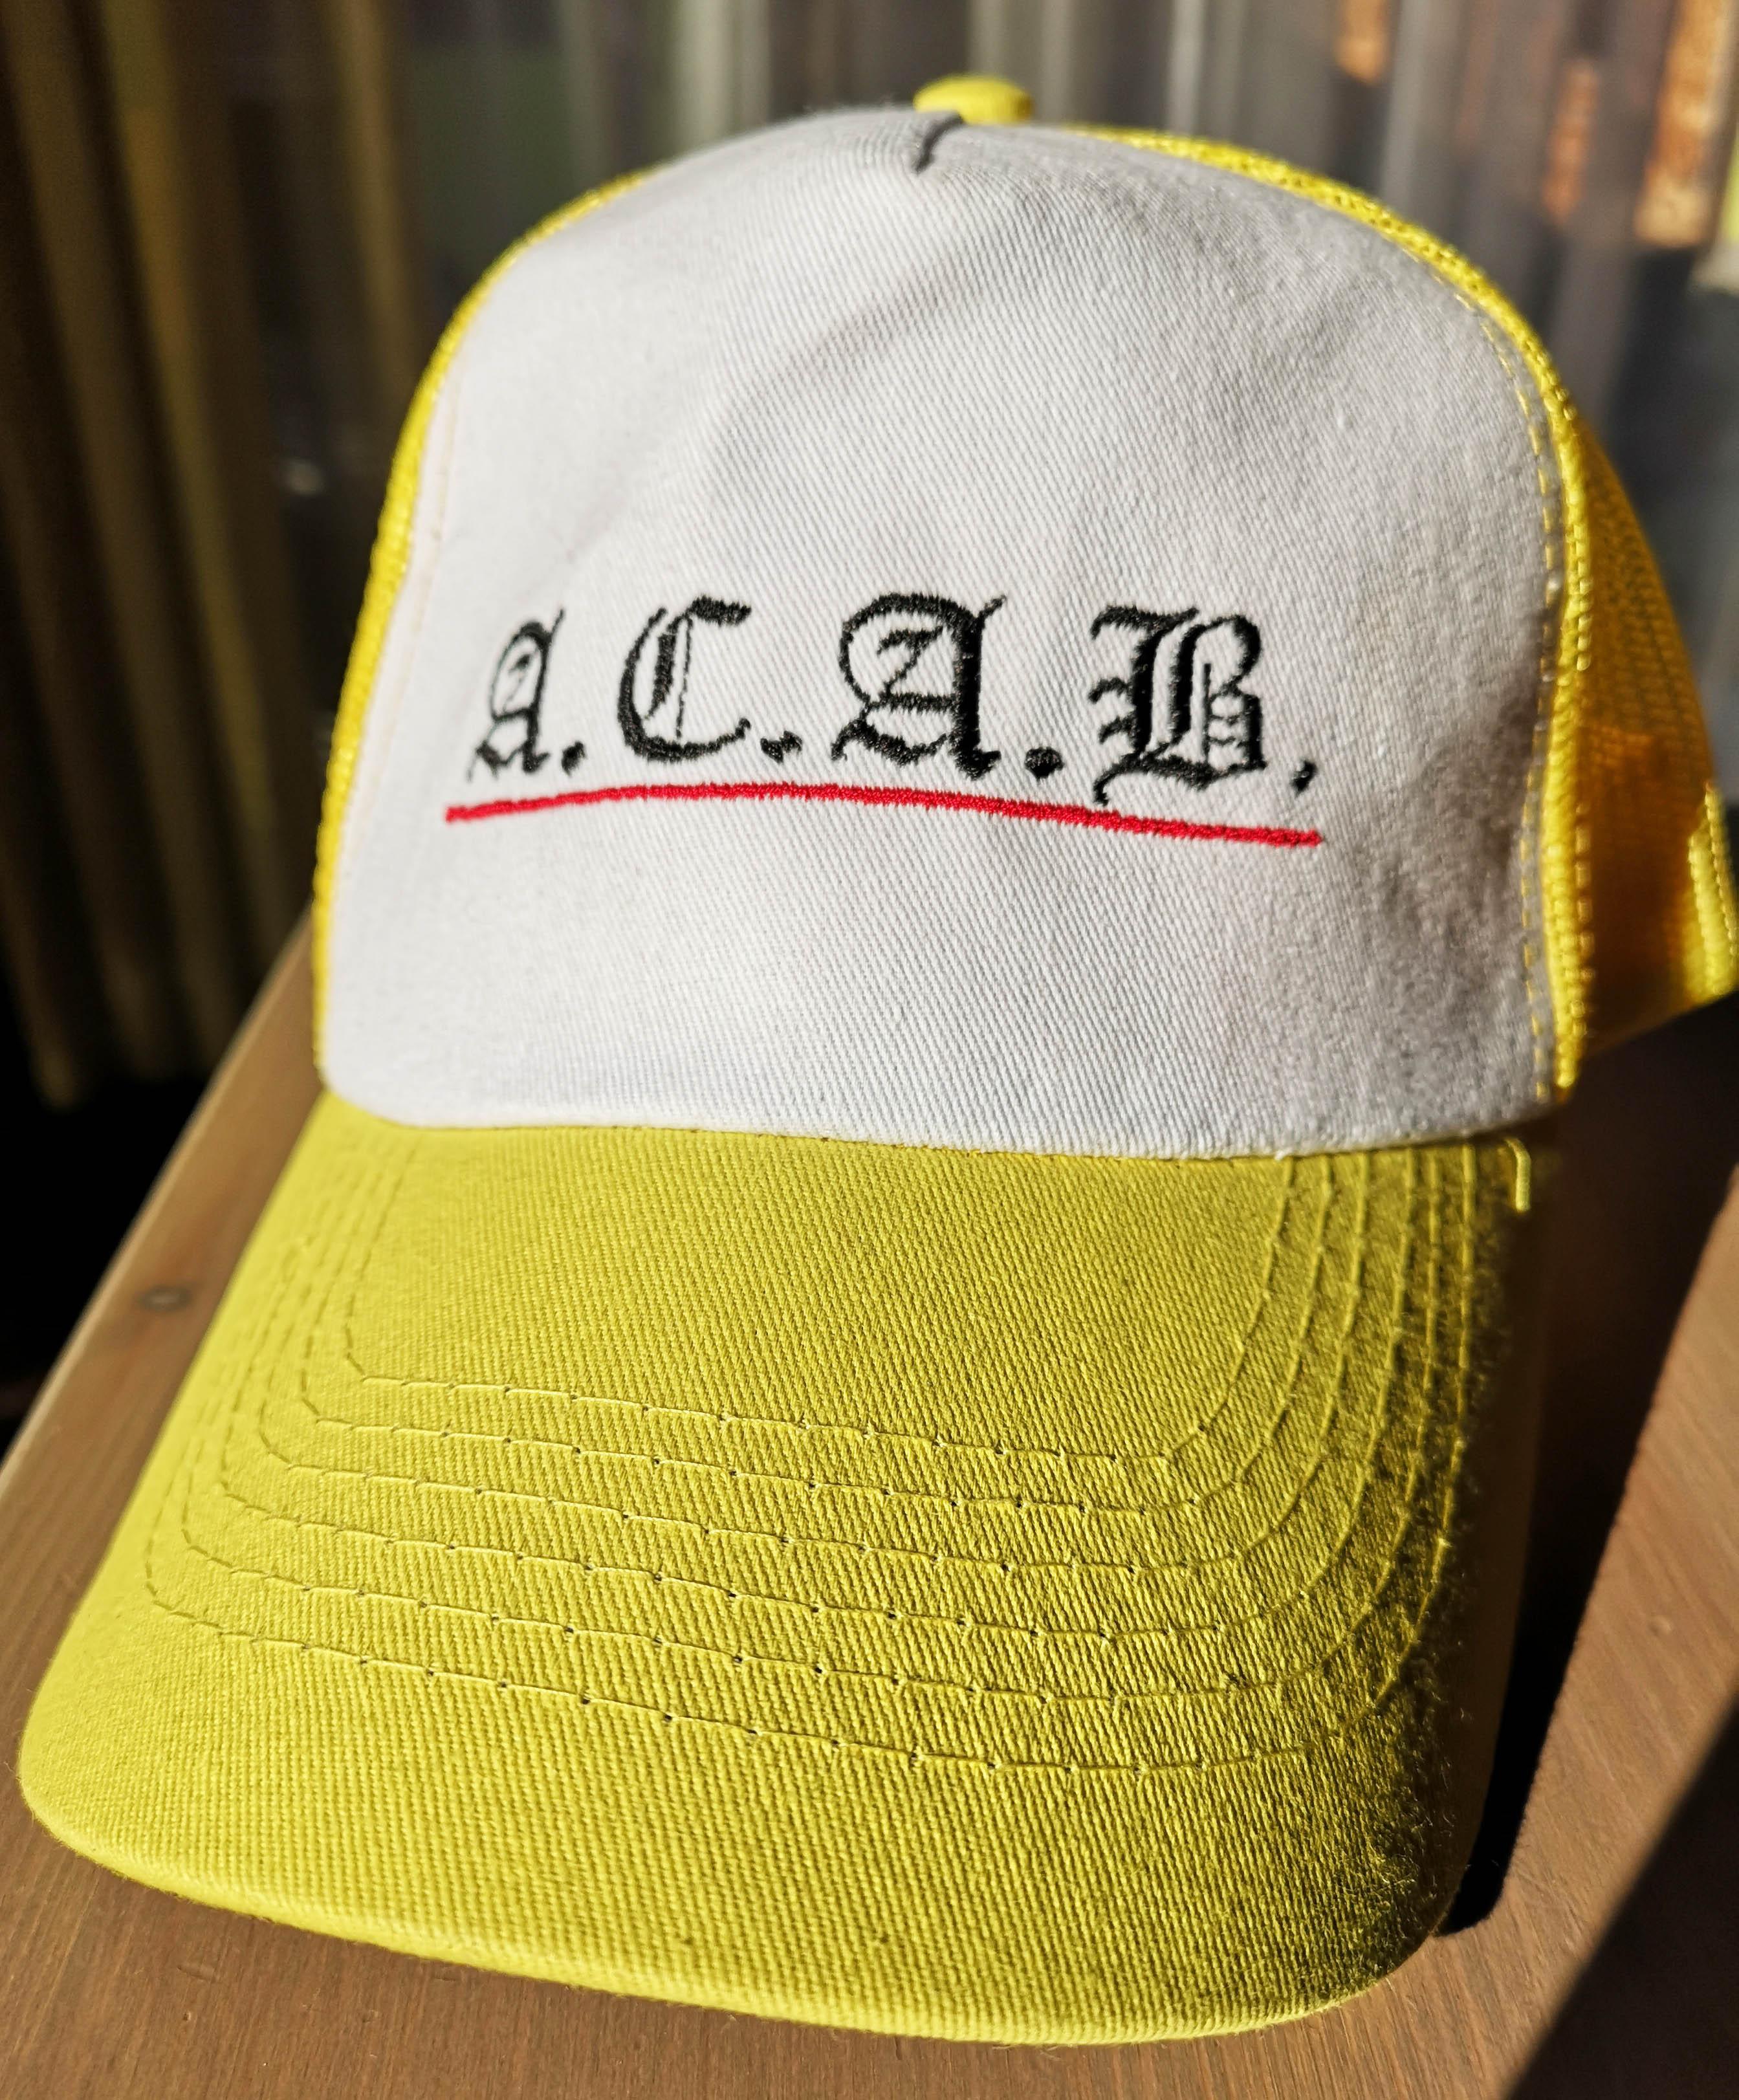 A.C.A.B. - A.C.A.B.